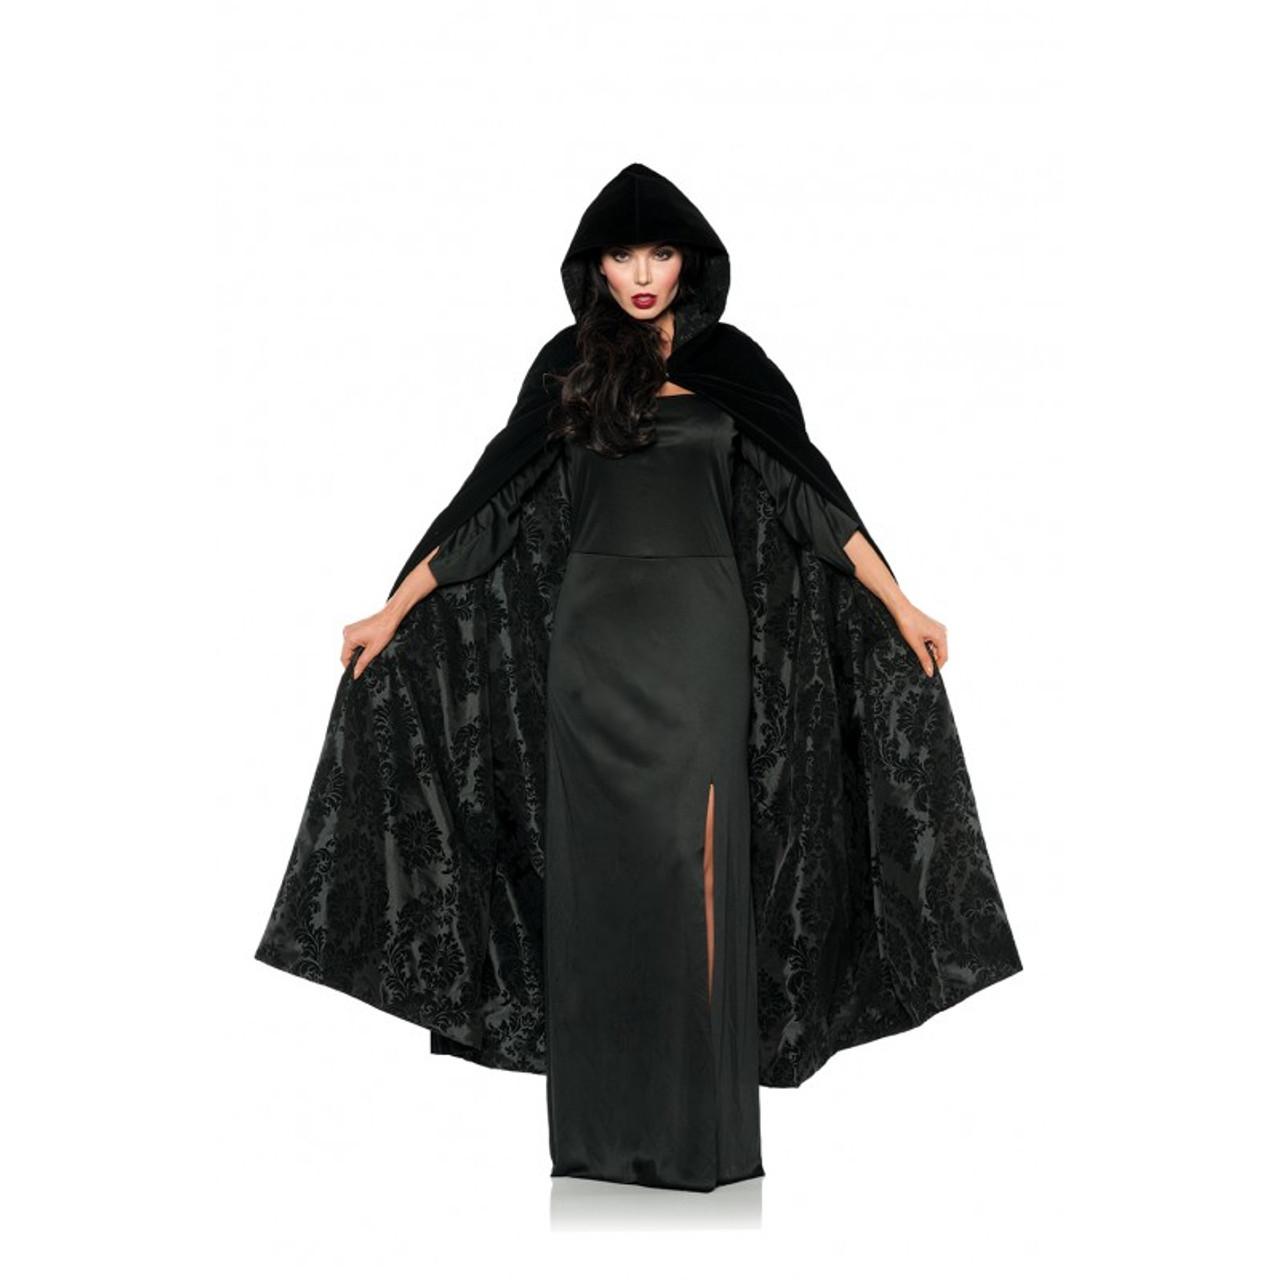 Halloween Cosplay Costume Velvet Hooded Cape Medieval Renaissance Cloak One Size